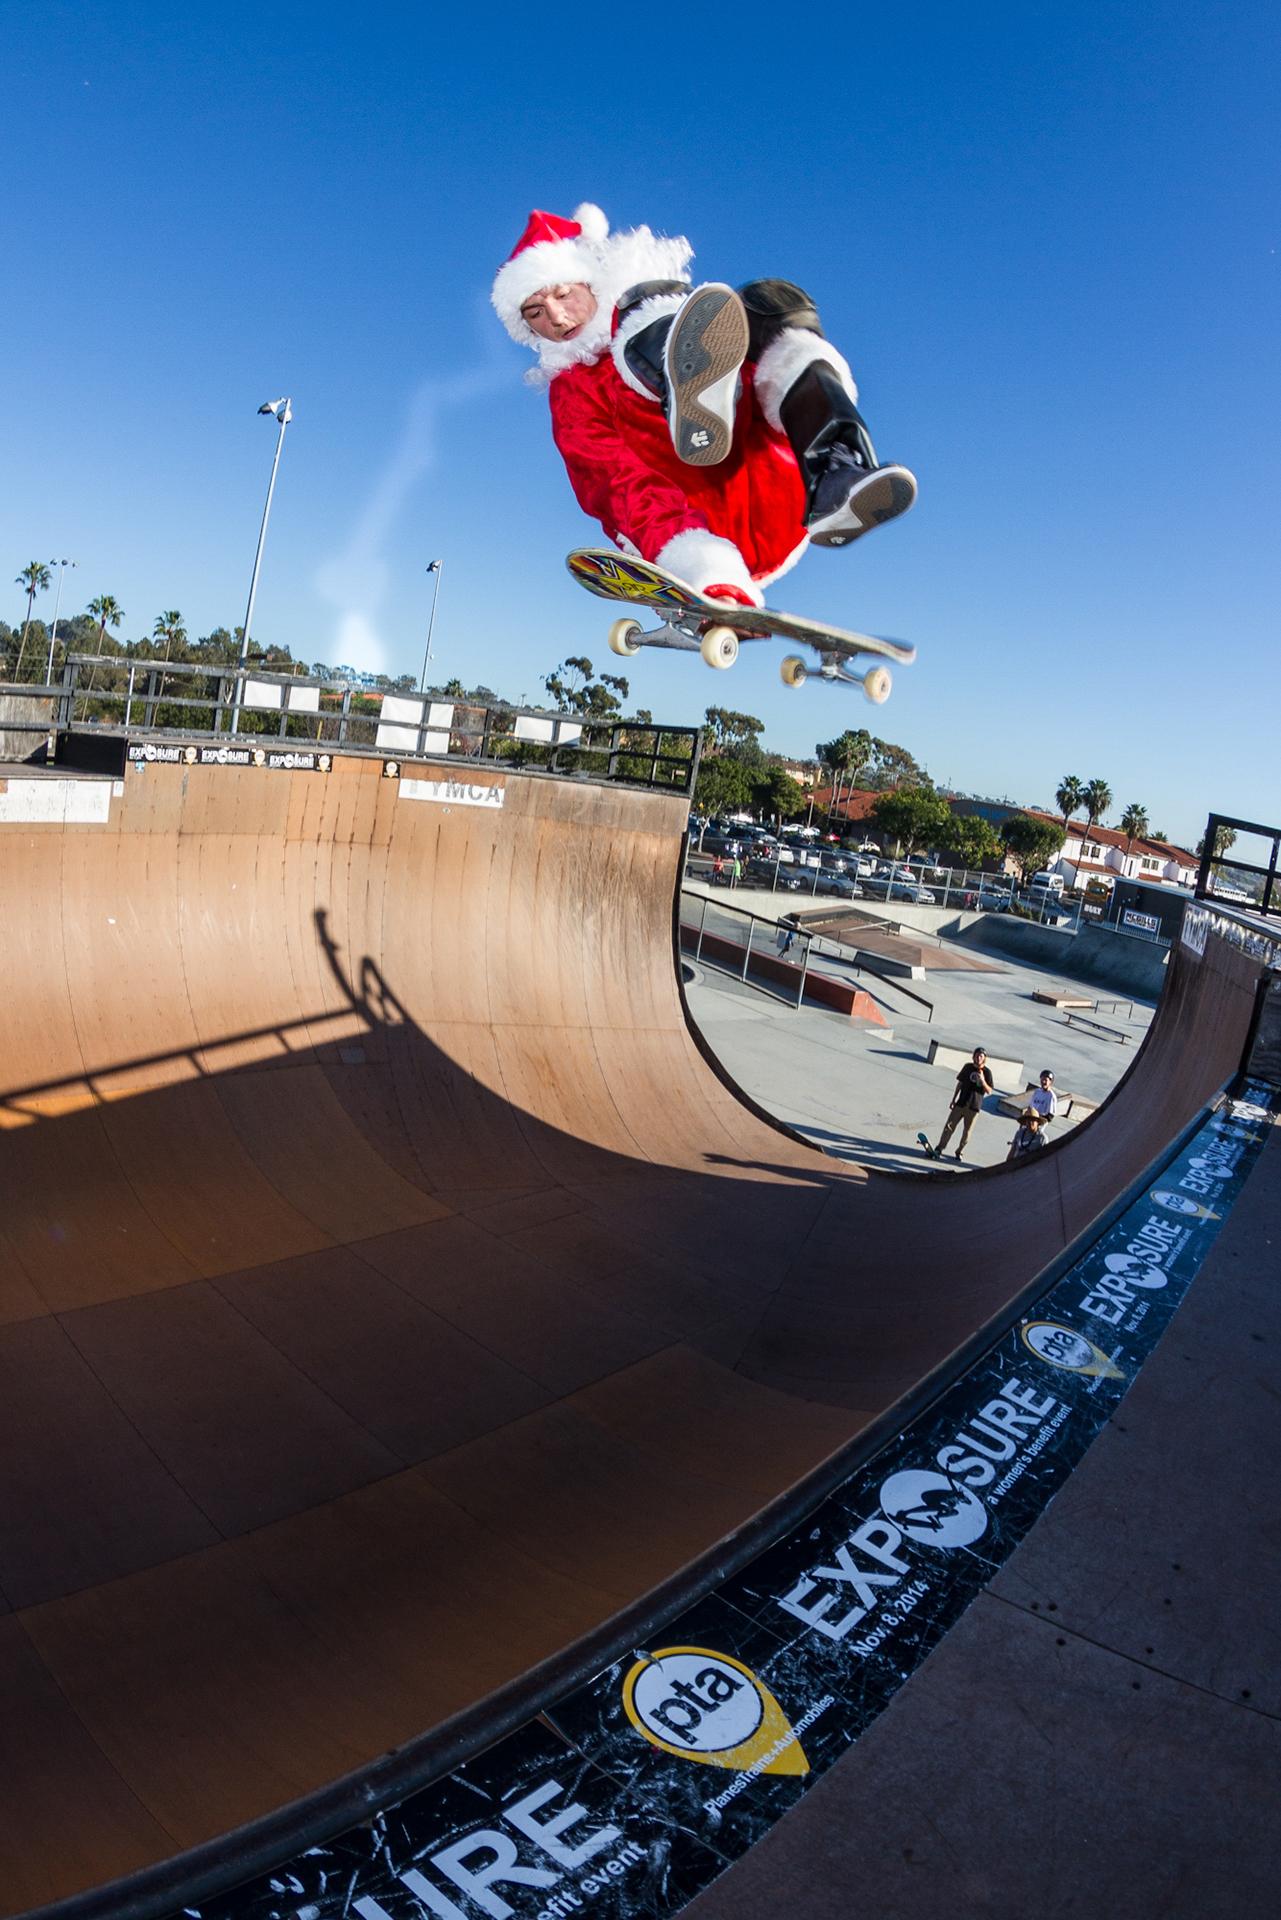 Kickflip Lein Gallery Santa Claus The Skateboarder Click Santa Claus Skateboard